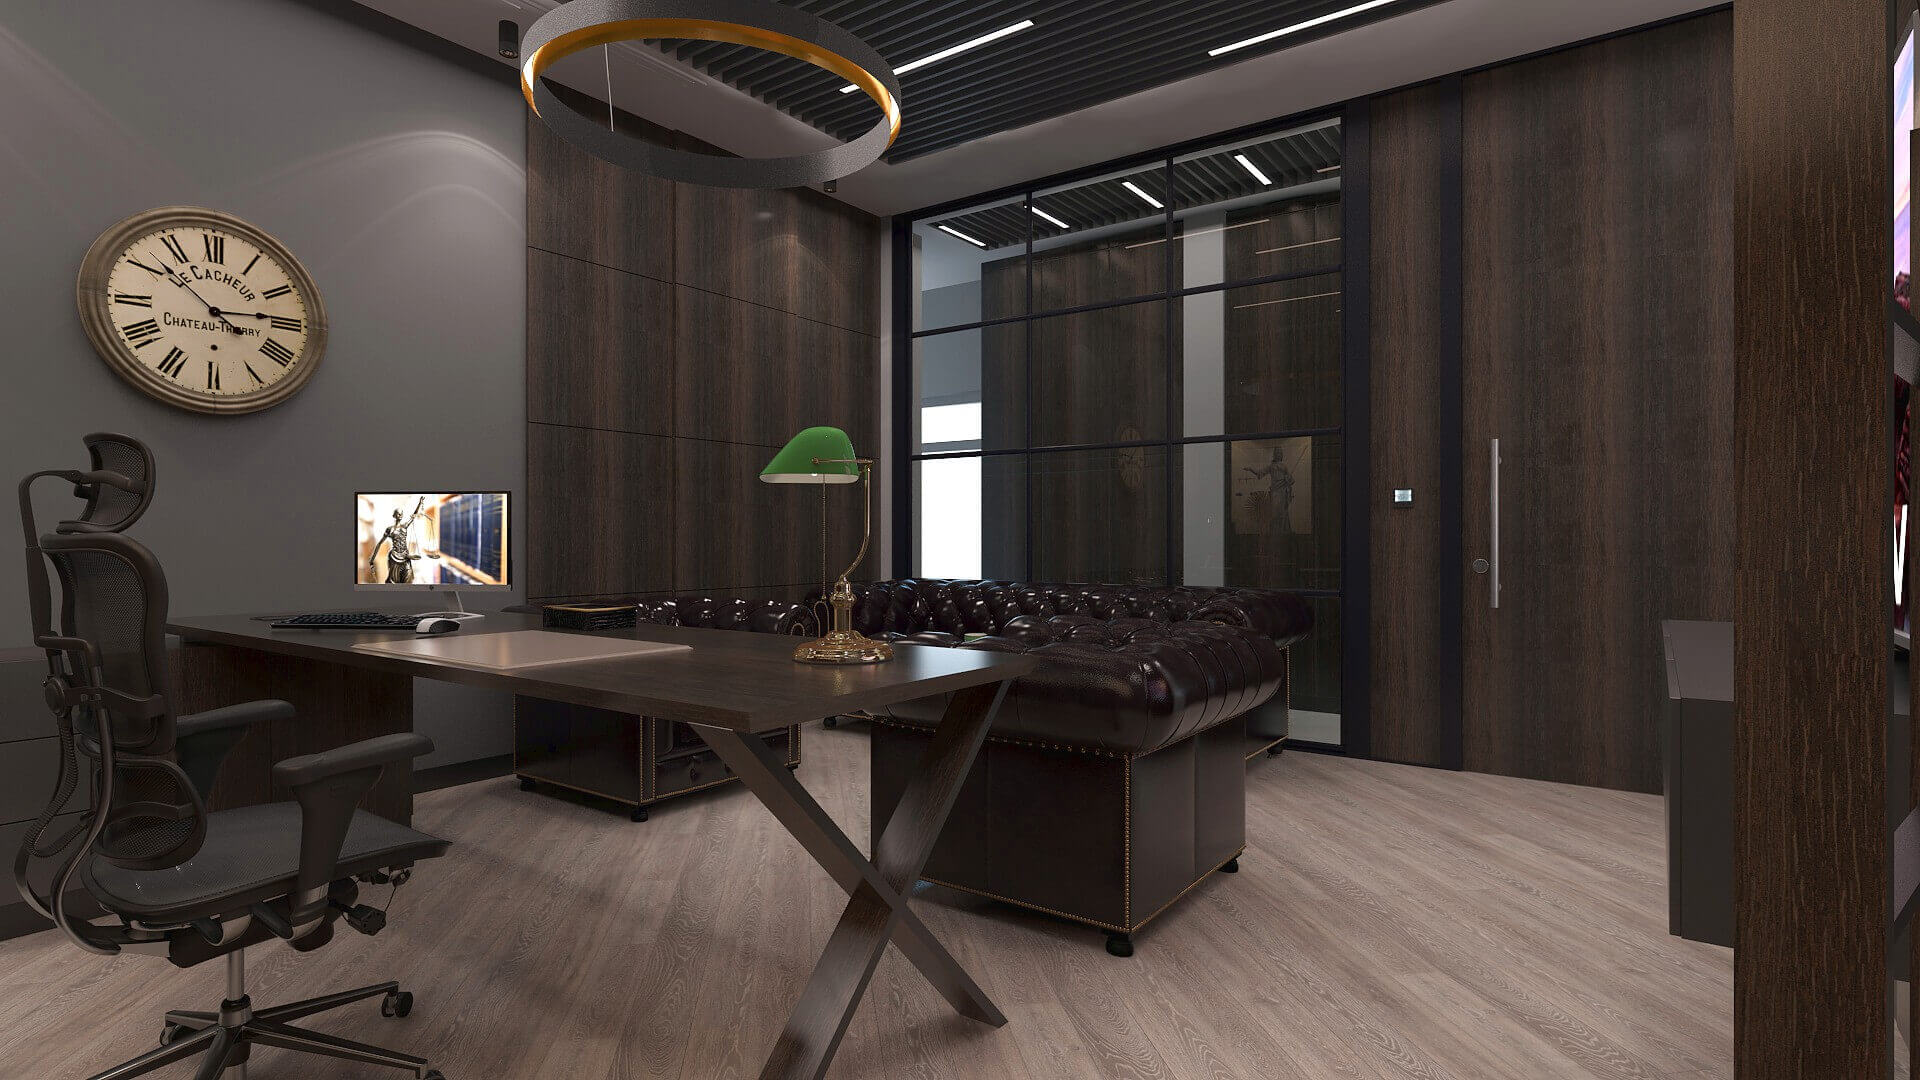 ofis mimari 2636 Şener Hukuk Ofisler